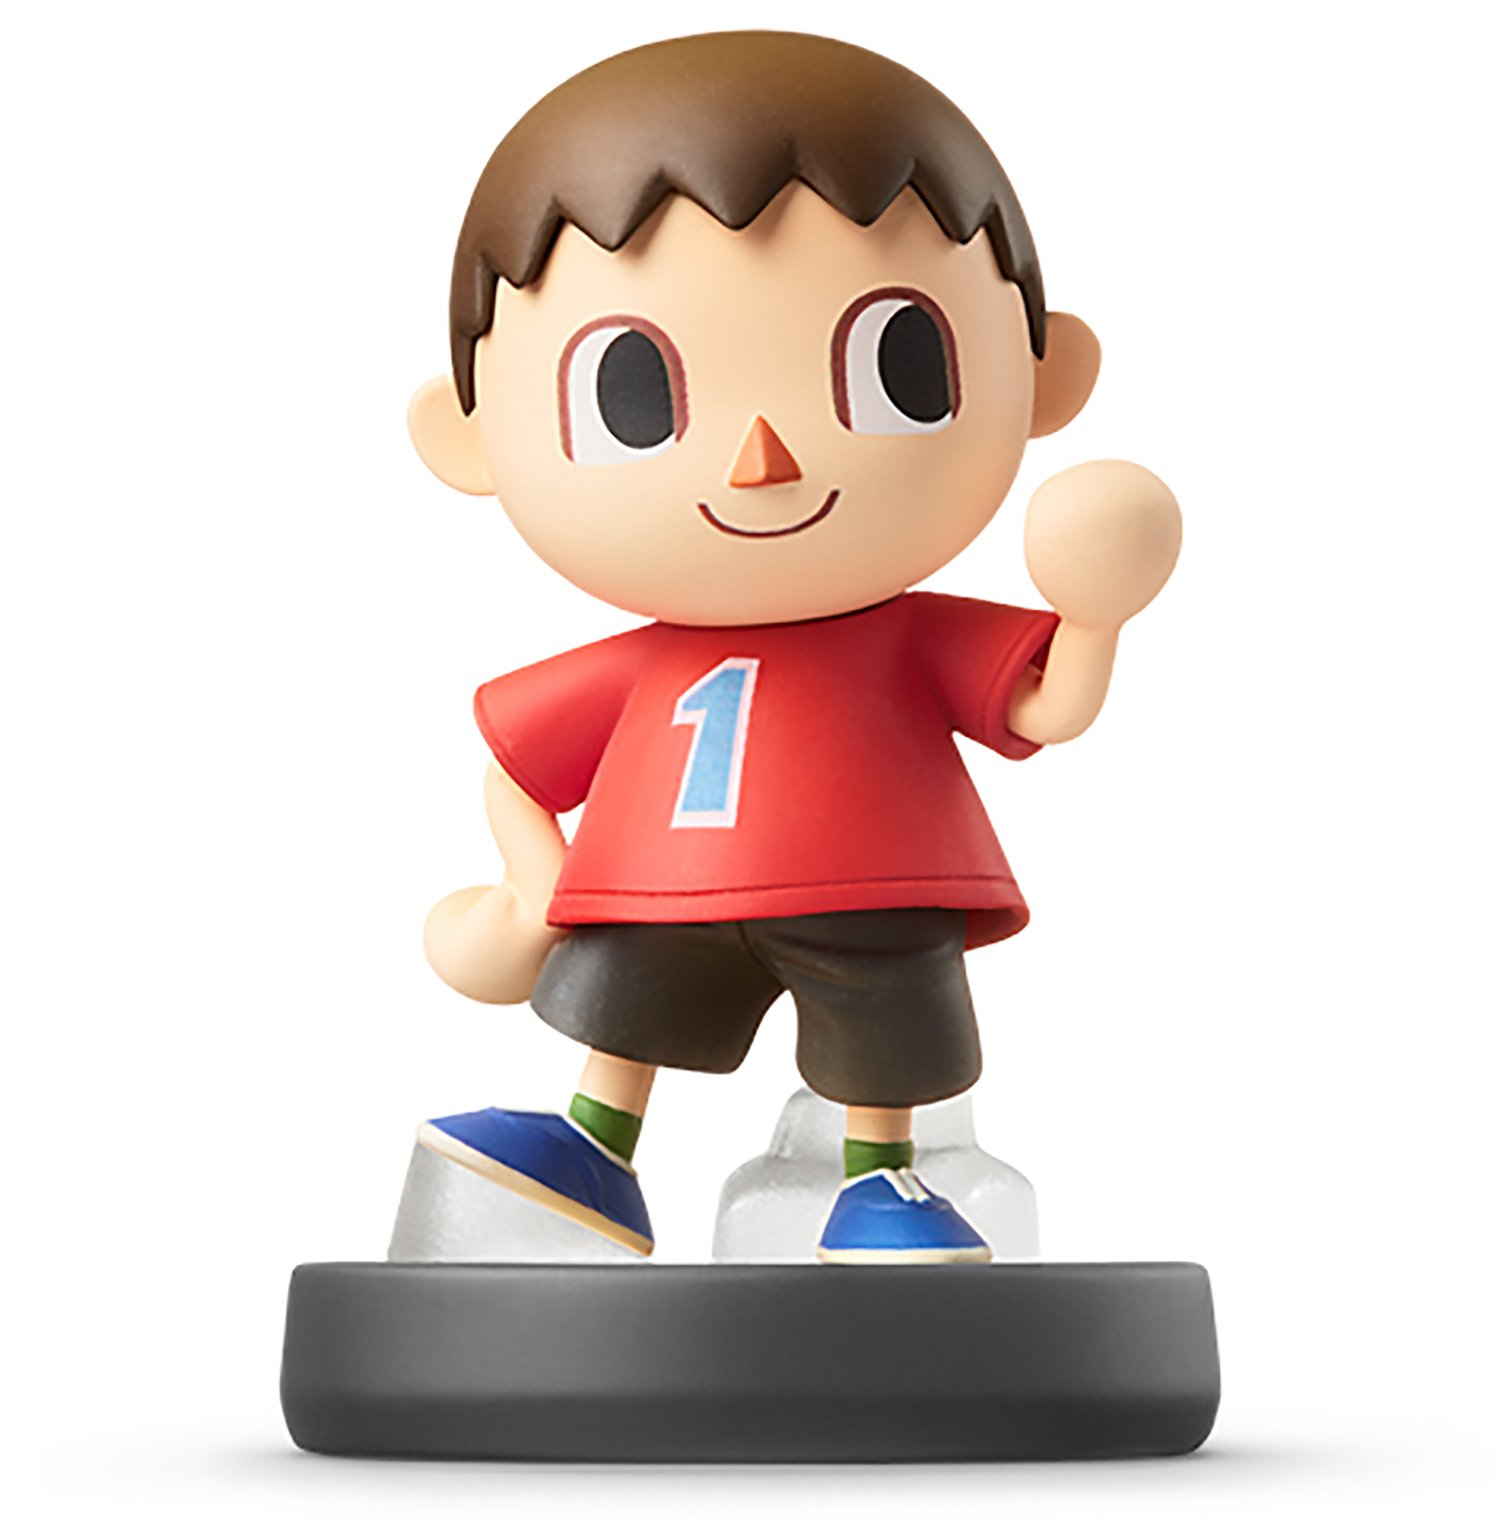 Villager amiibo - Japan Import (Super Smash Bros Series)